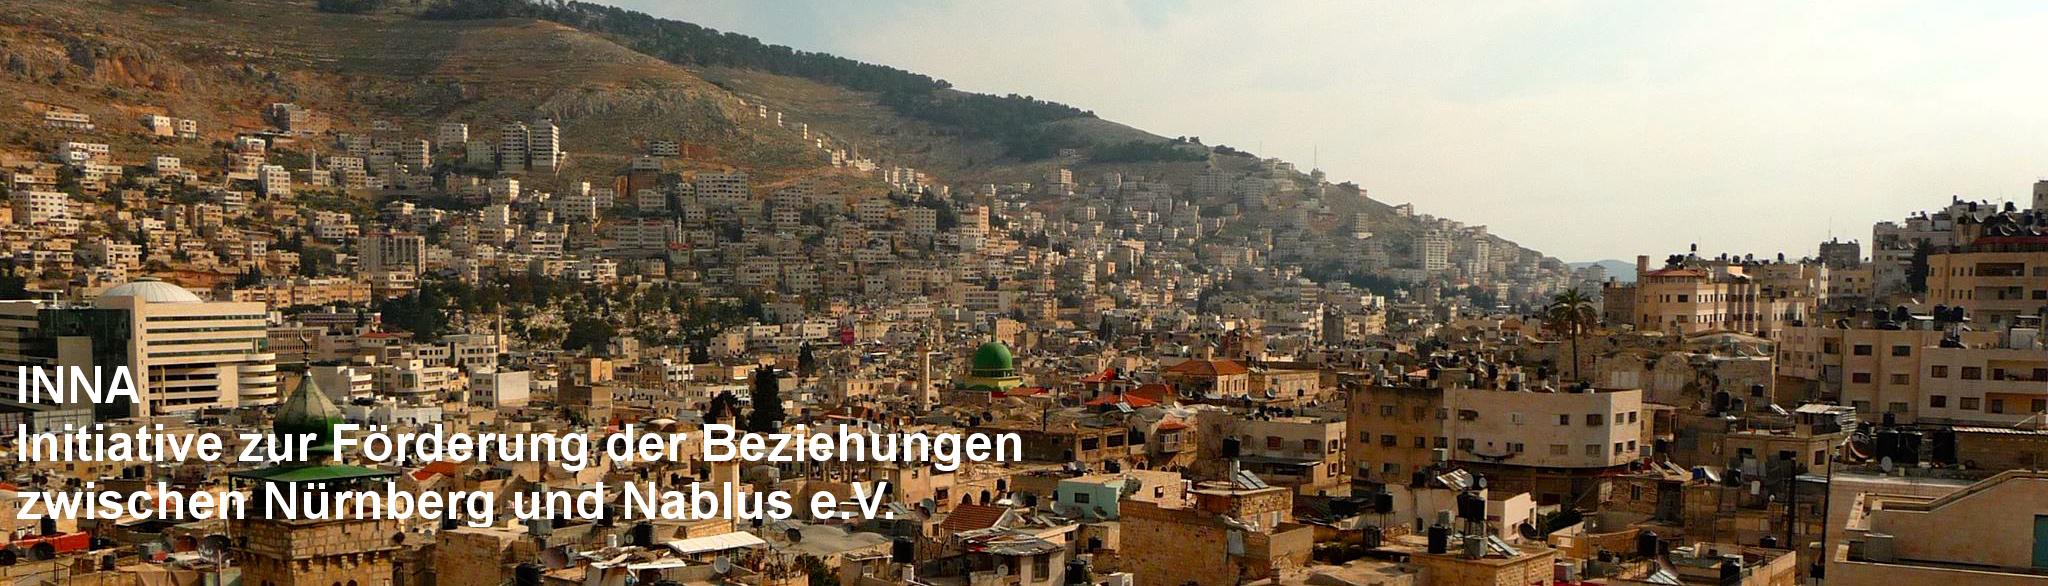 banner-nablus